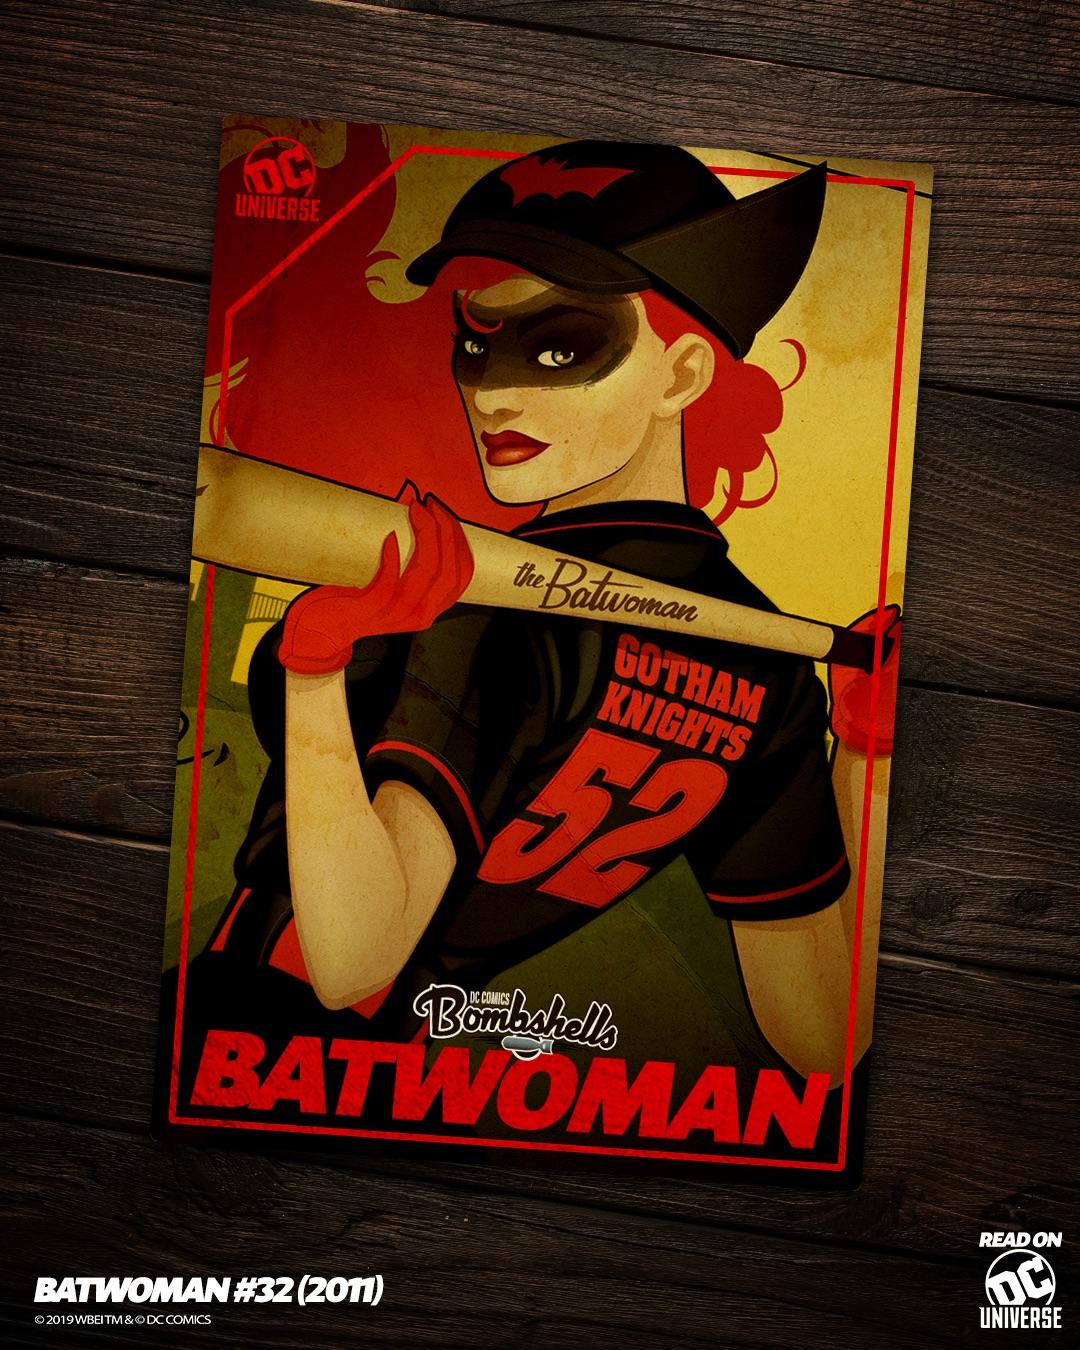 Batwoman Bombshells baseball card